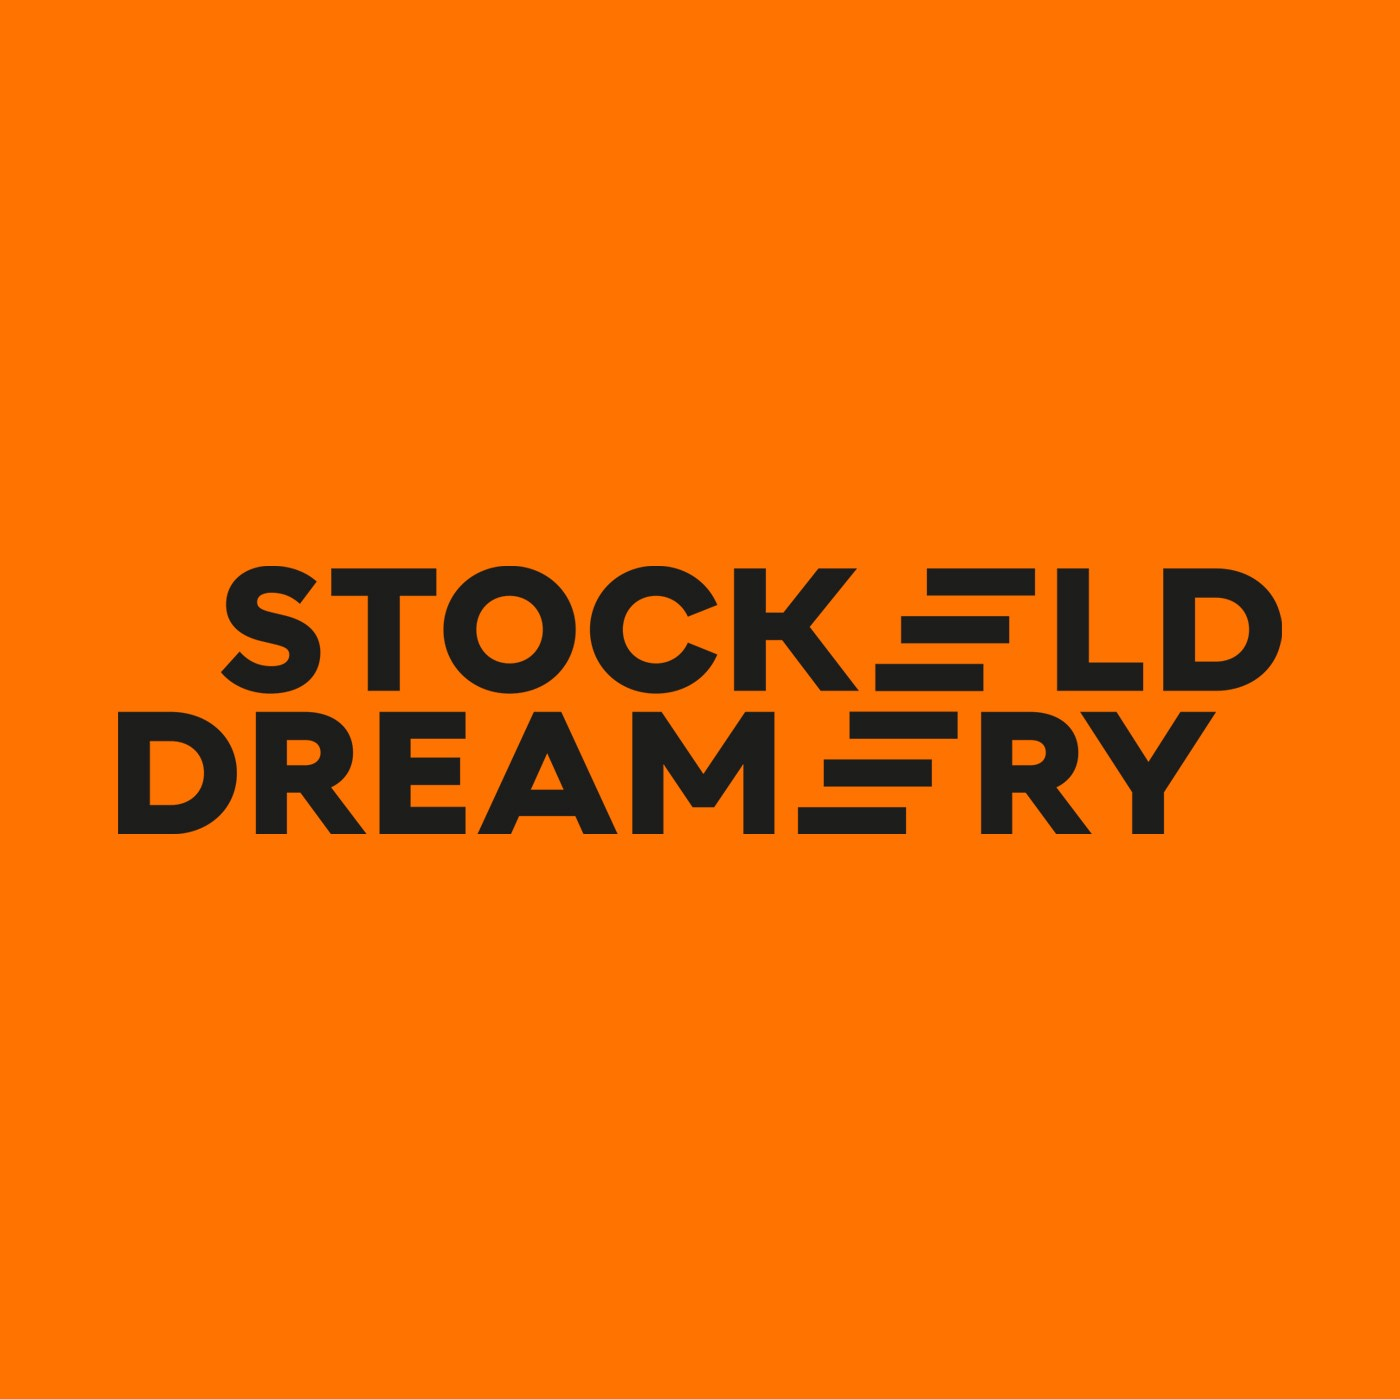 Stockheld Dreamery's logo